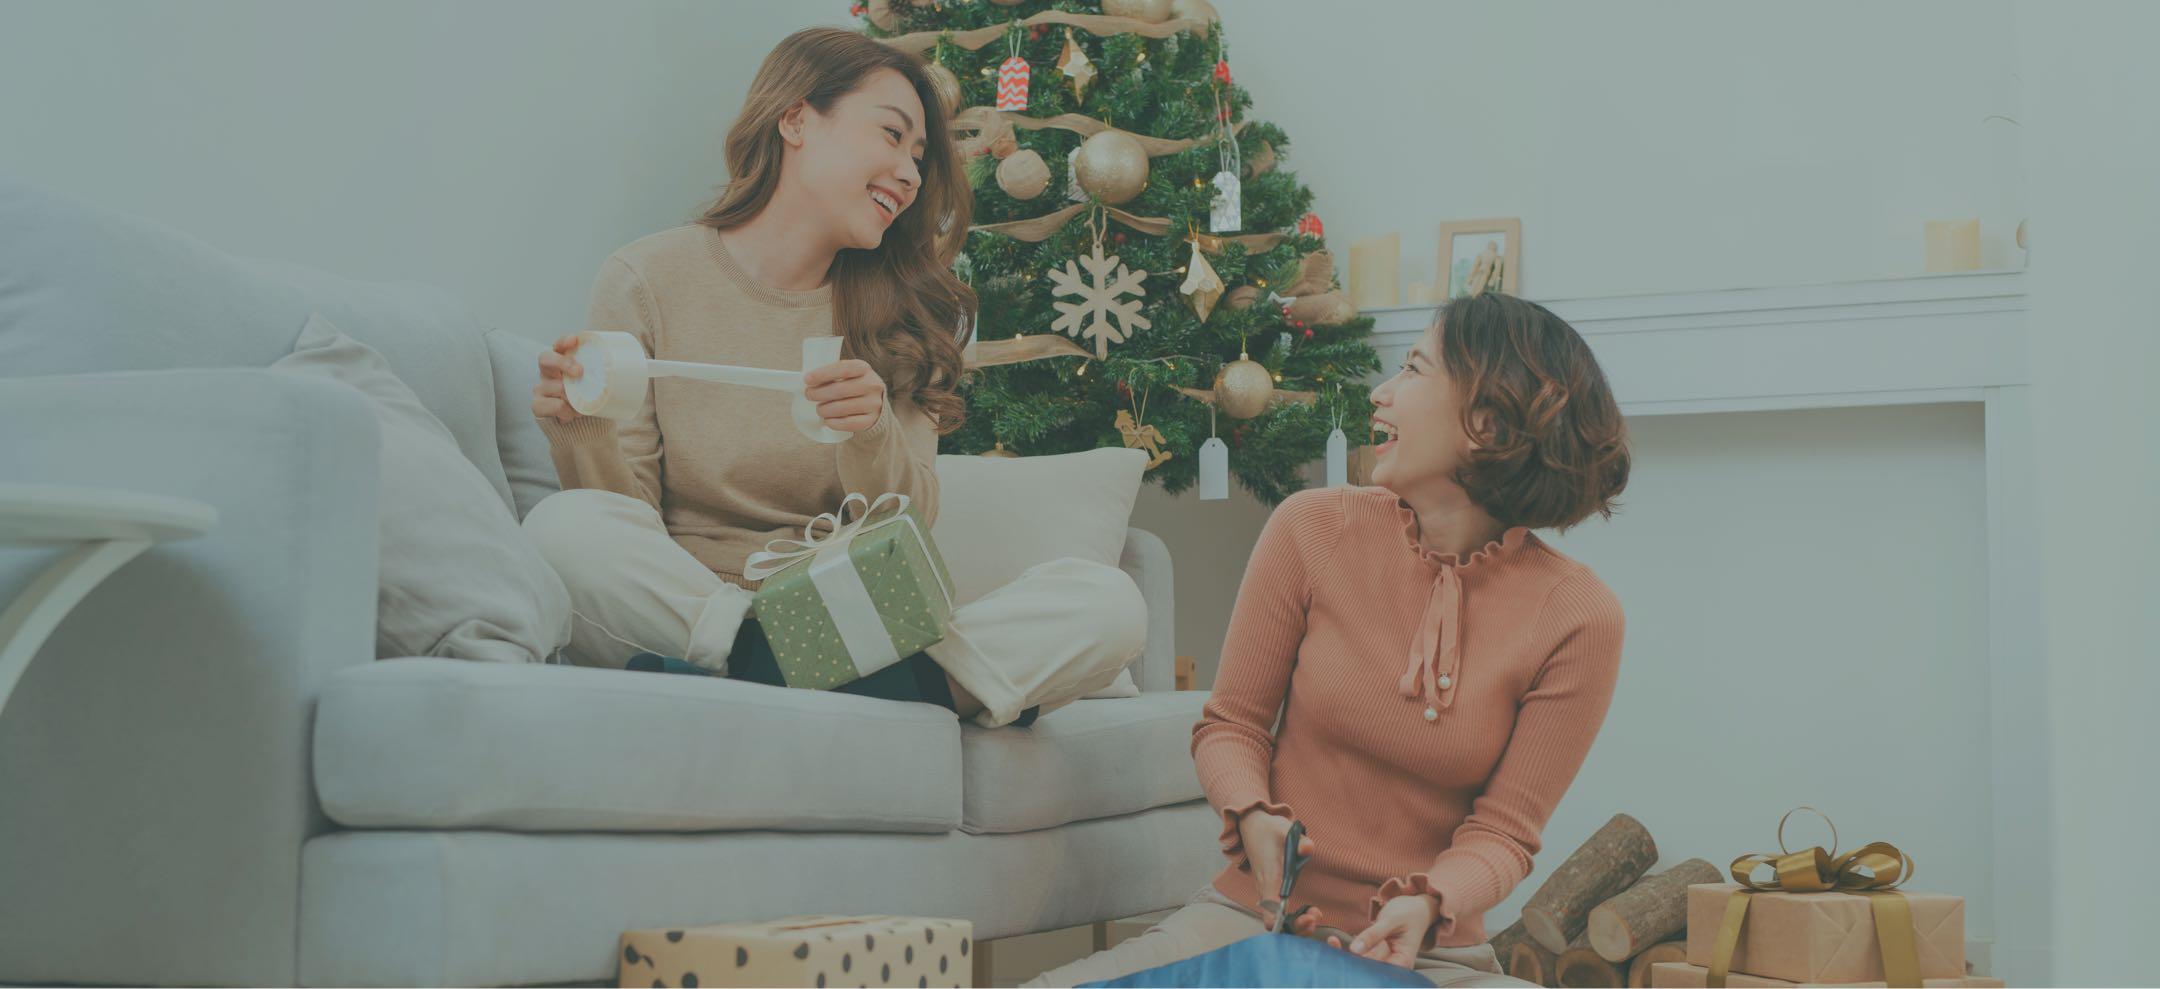 Gift-Christmas-Friends-Chinese-Marketing